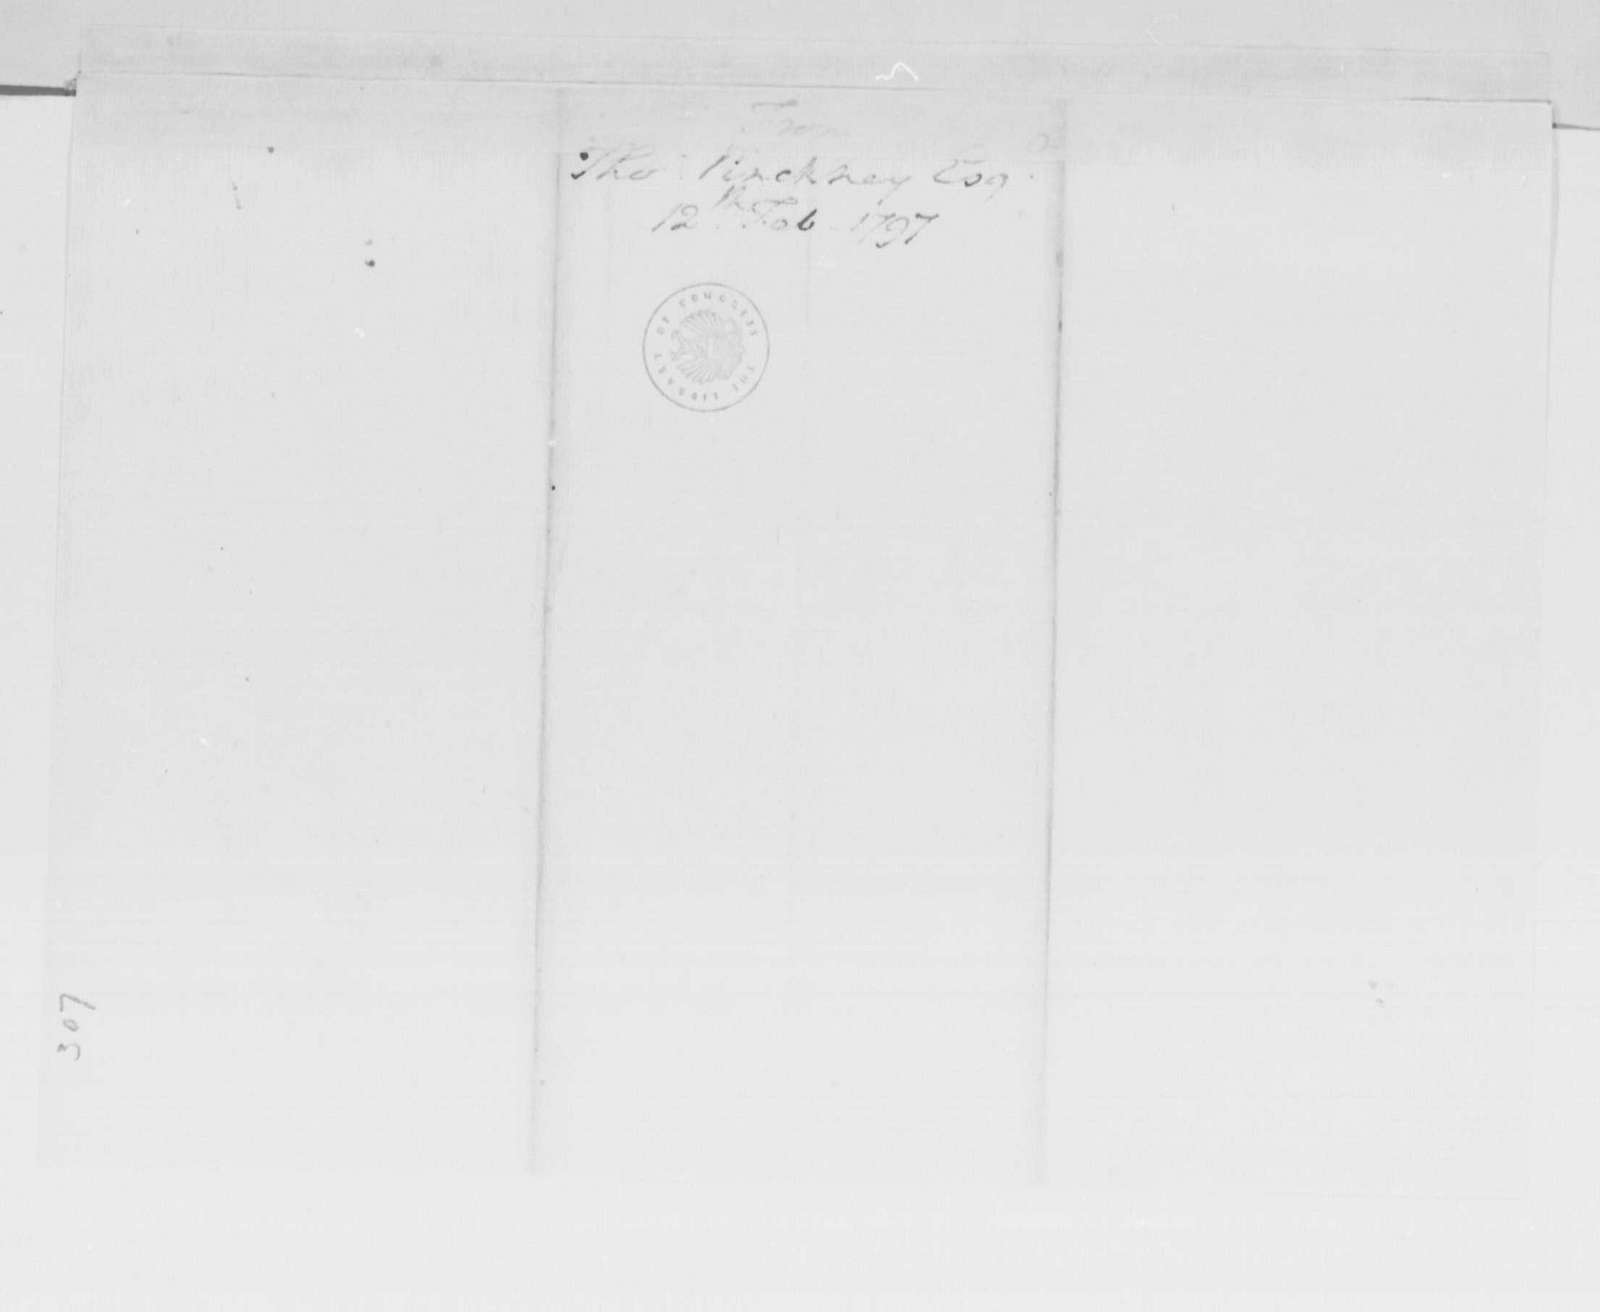 George Washington Papers, Series 4, General Correspondence: Thomas Pinckney to George Washington, February 12, 1797